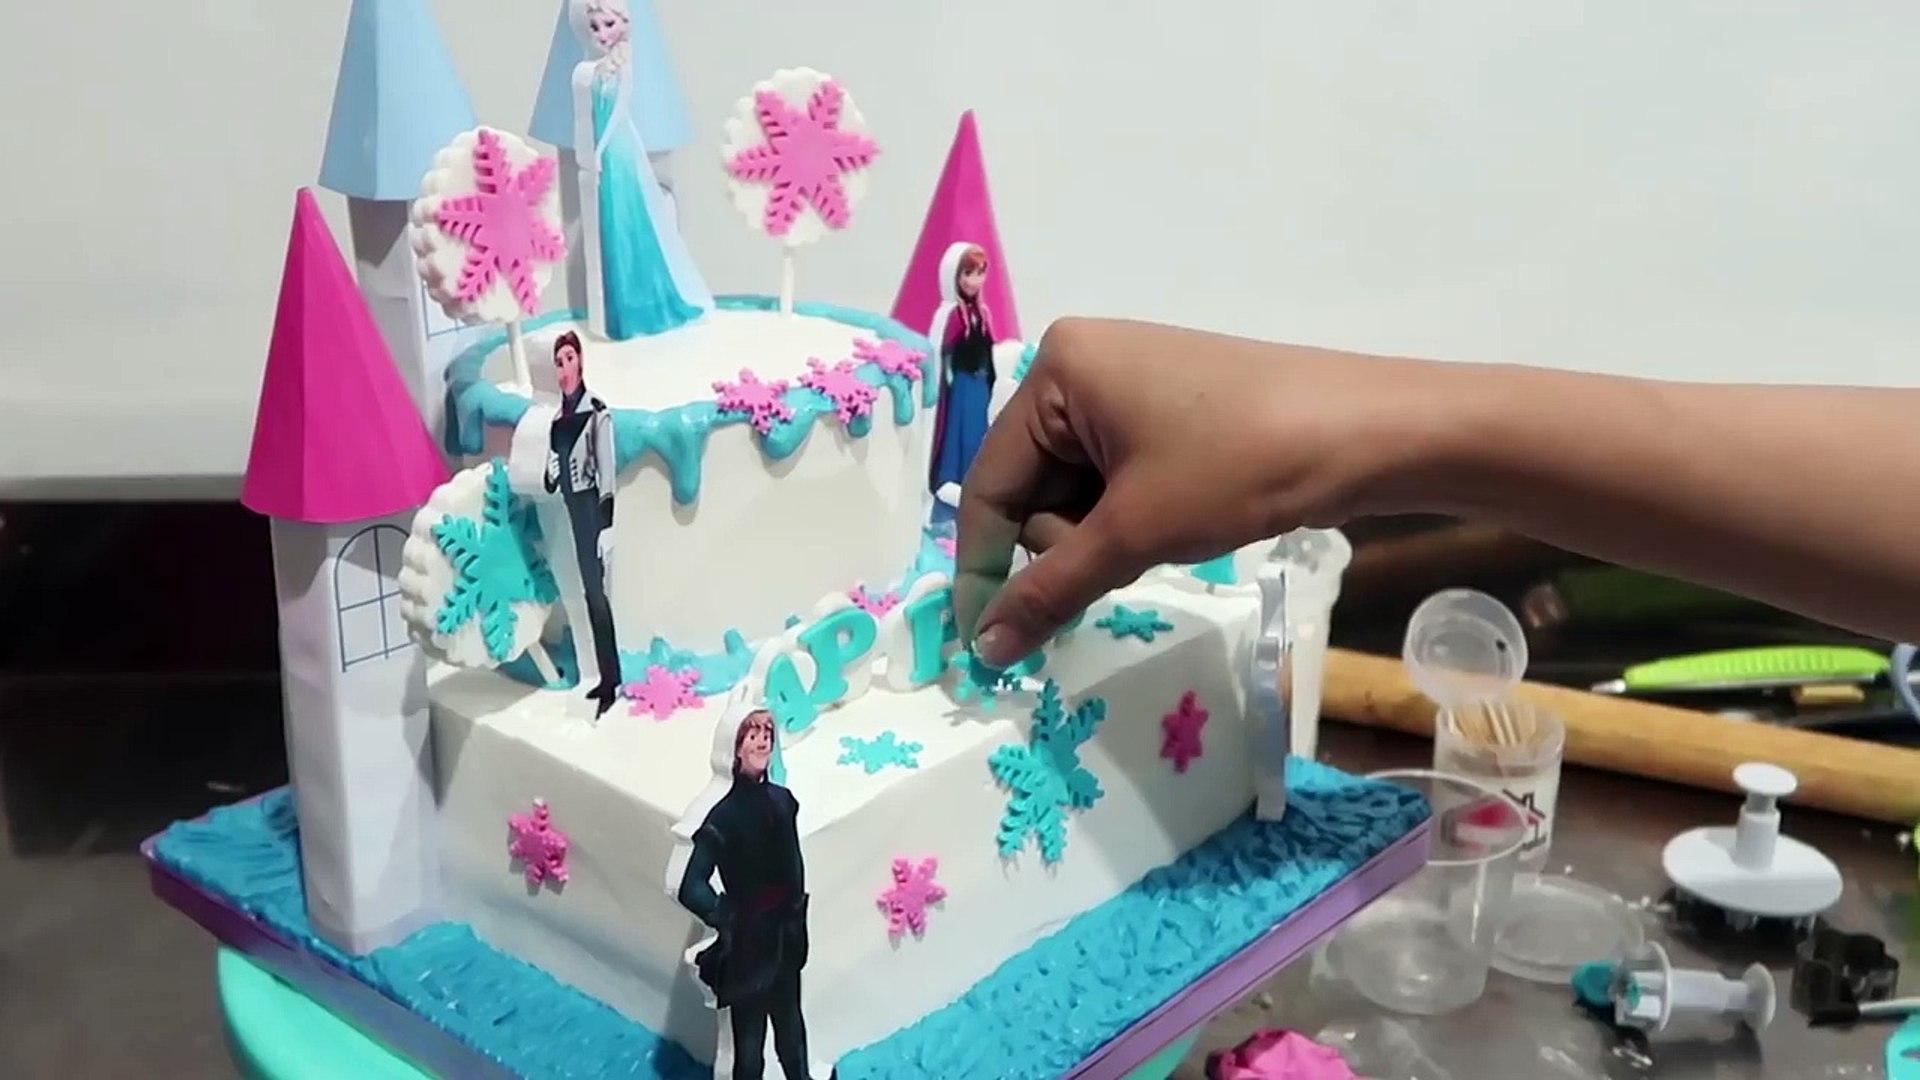 How To Make Birthday Cake Frozen Elsa Cara Membuat Kue Ulang Tahun Frozen